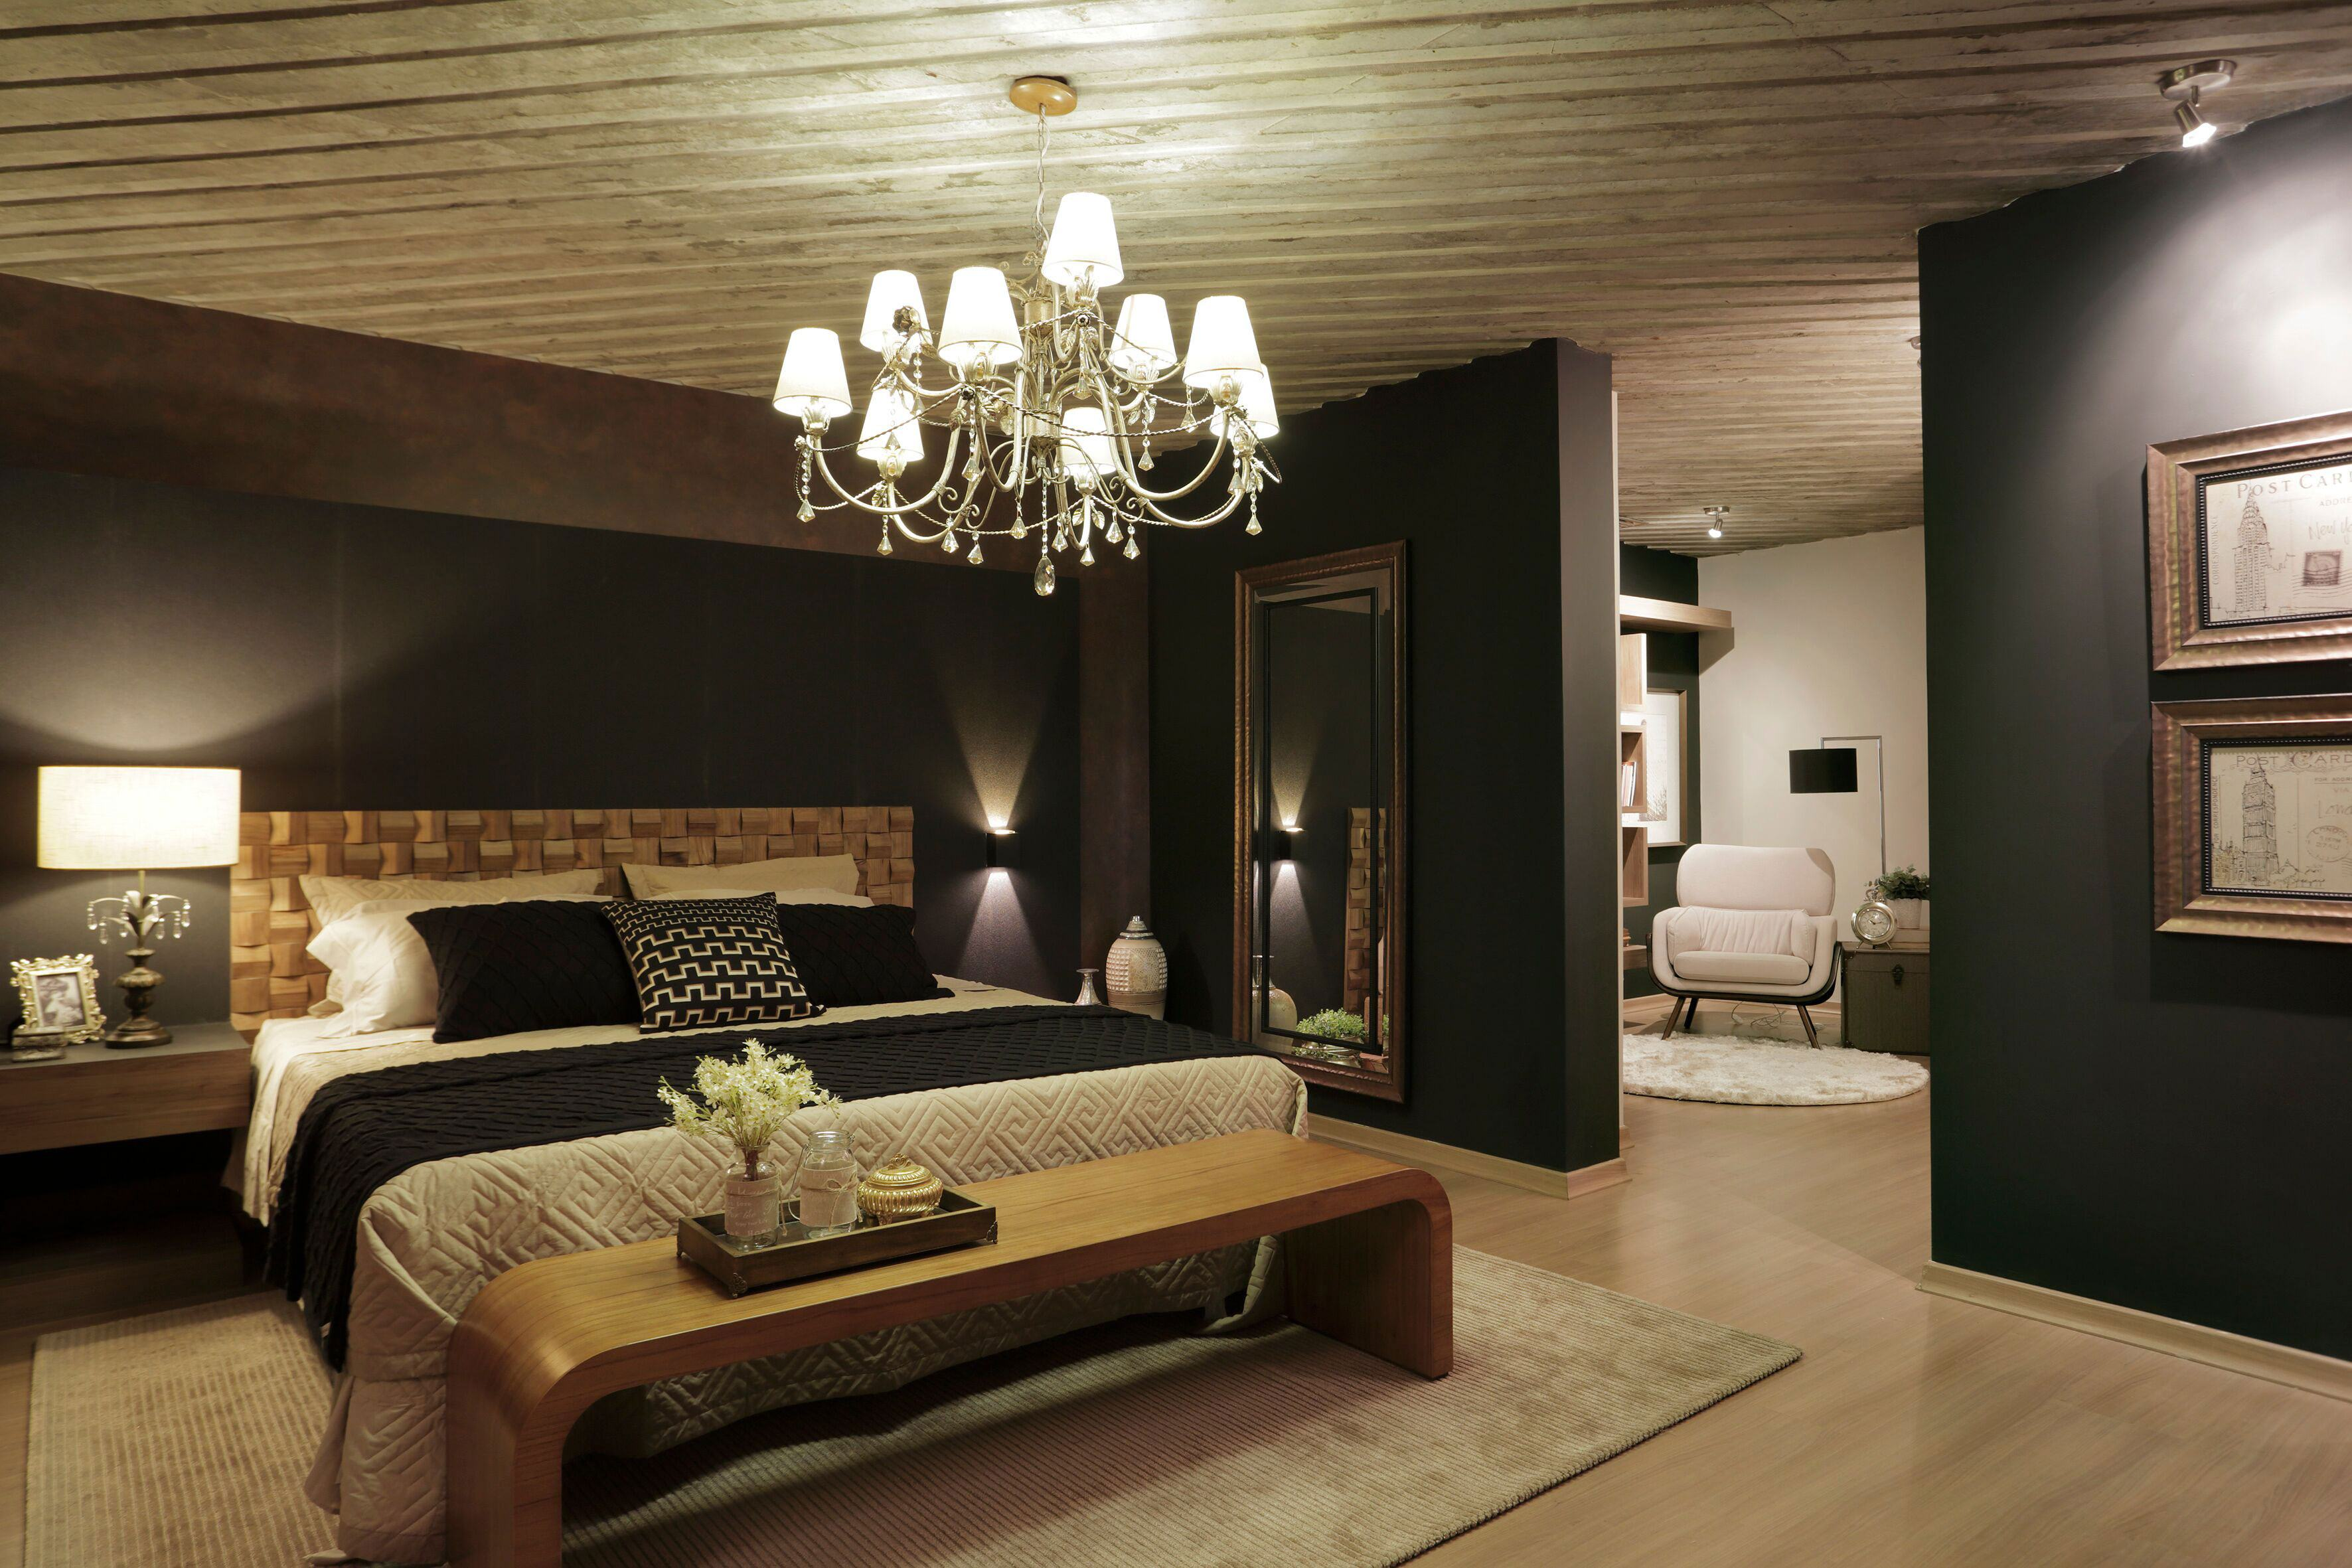 Royal Bedroom Pinterest